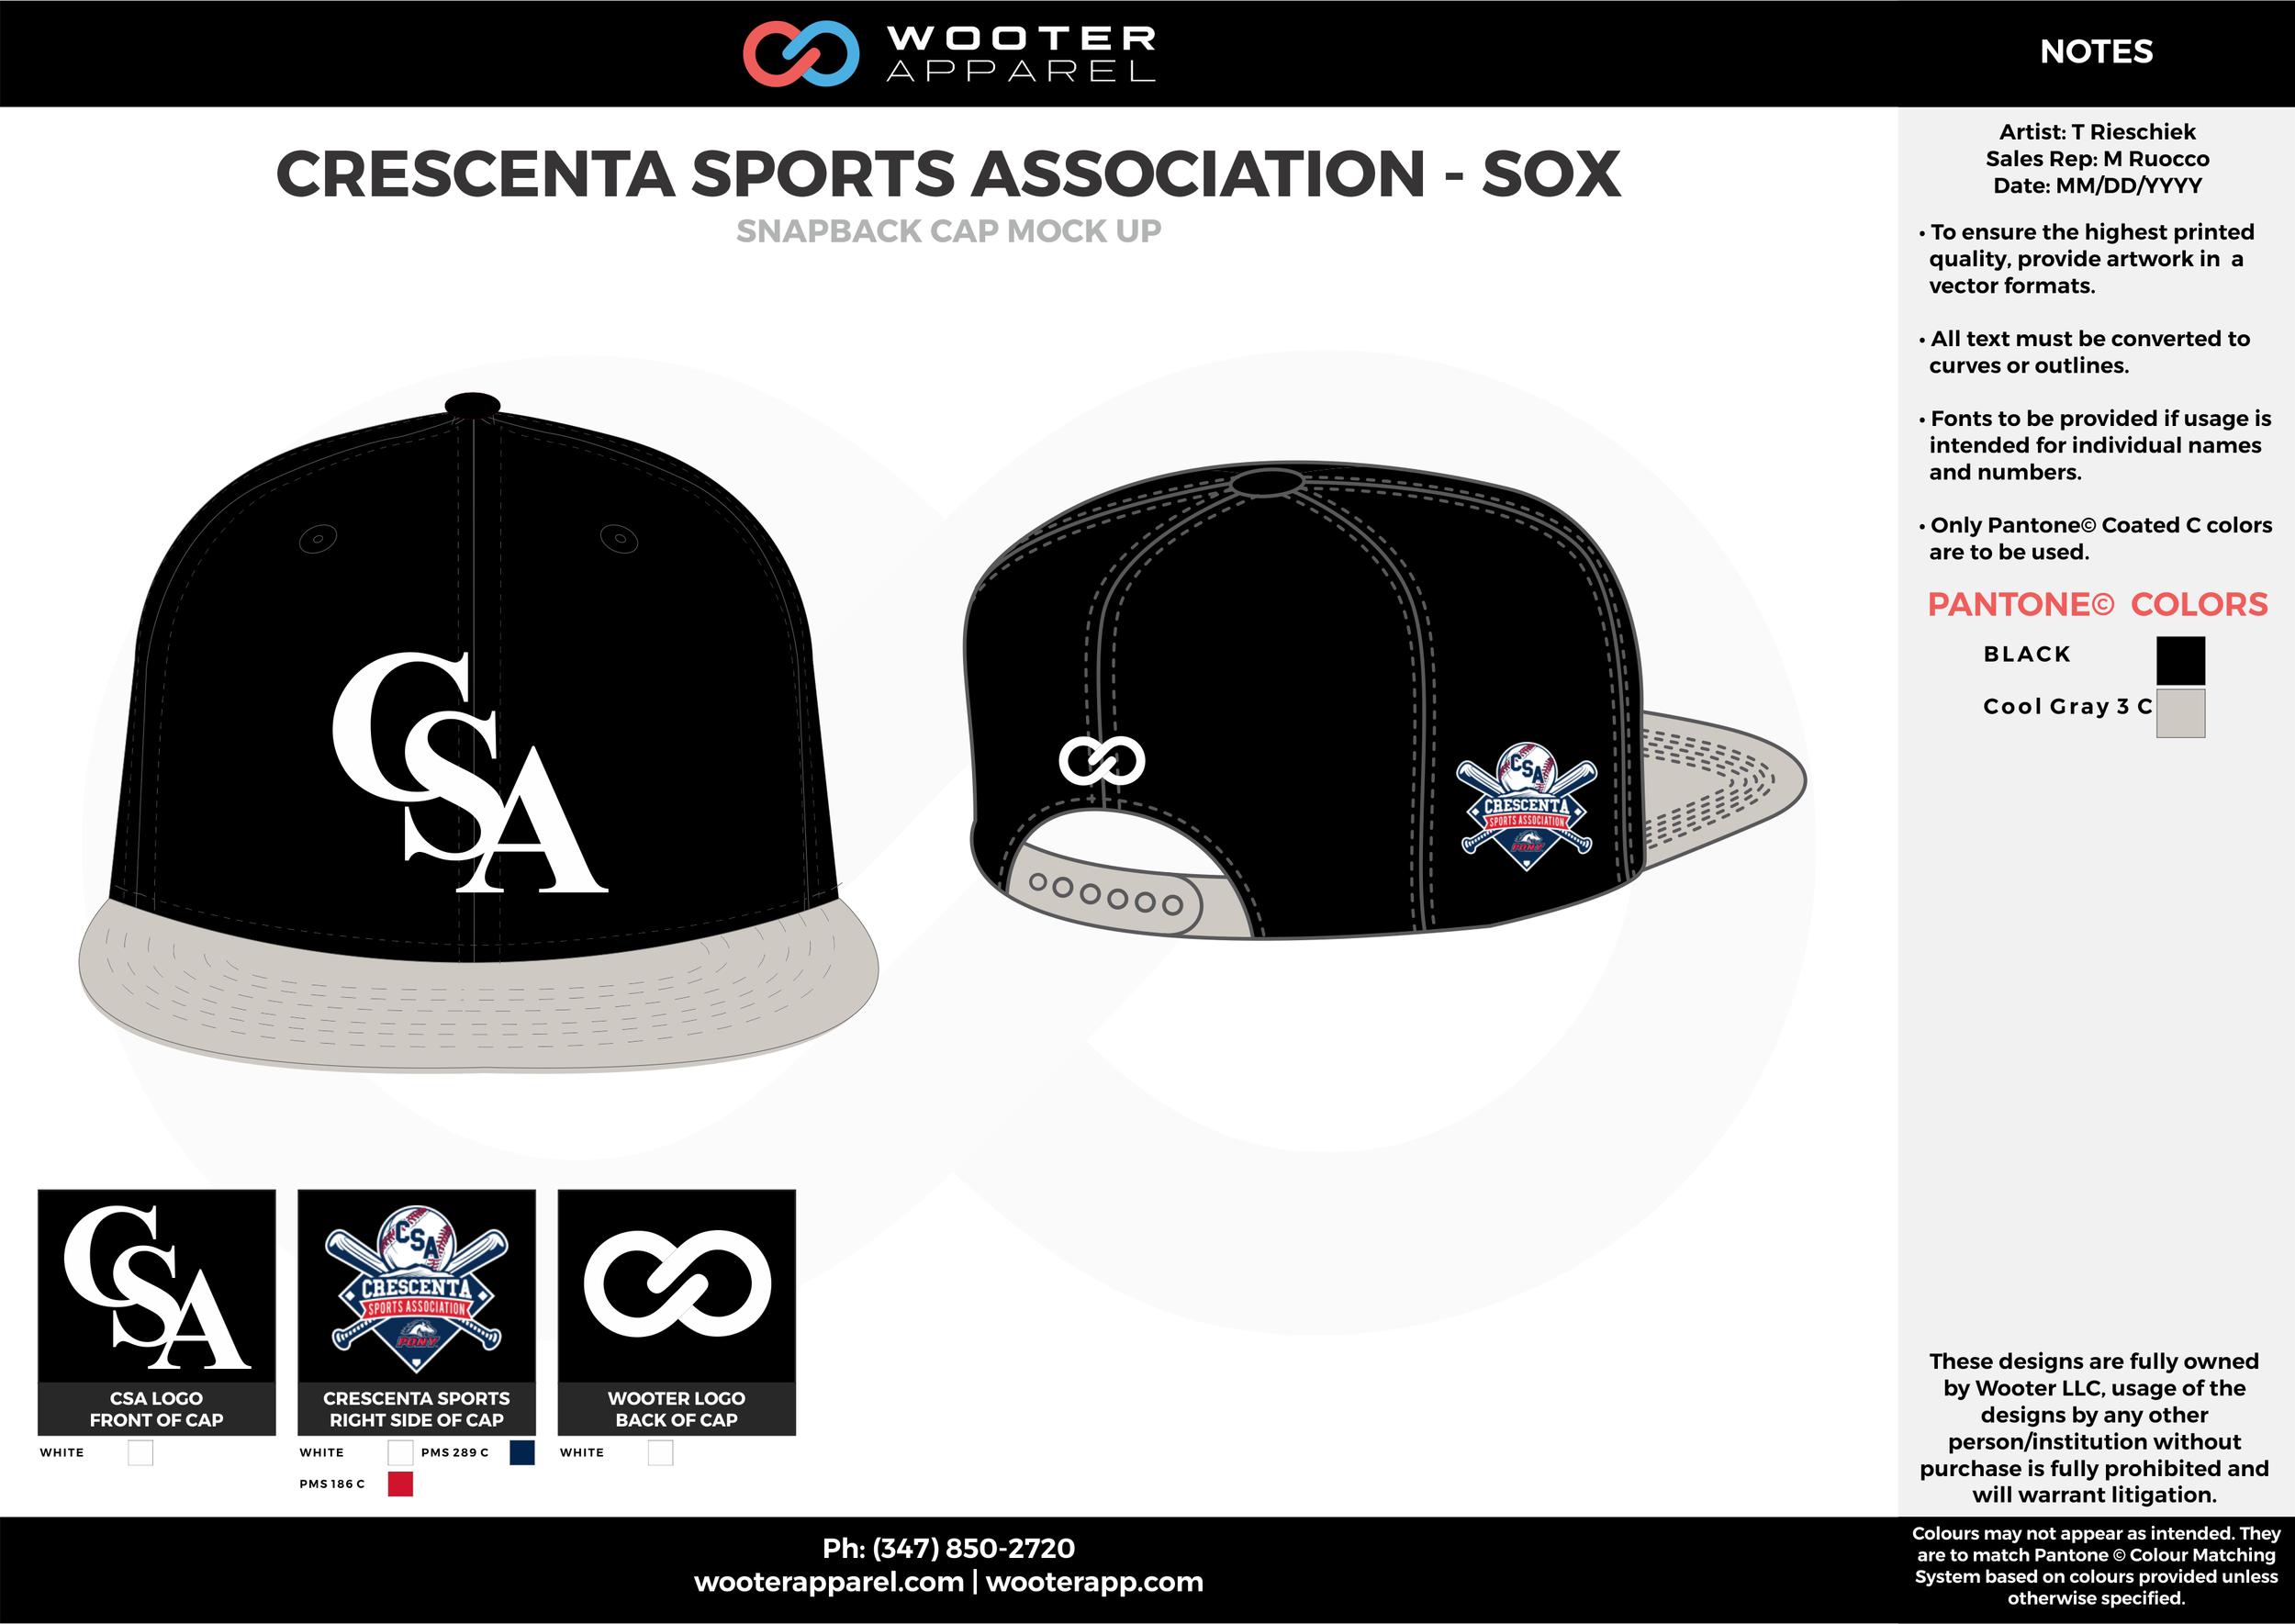 CRESCENTA SPORTS ASSOCIATION - SOX Black Gray white Basketball Snapback Hat and Cap